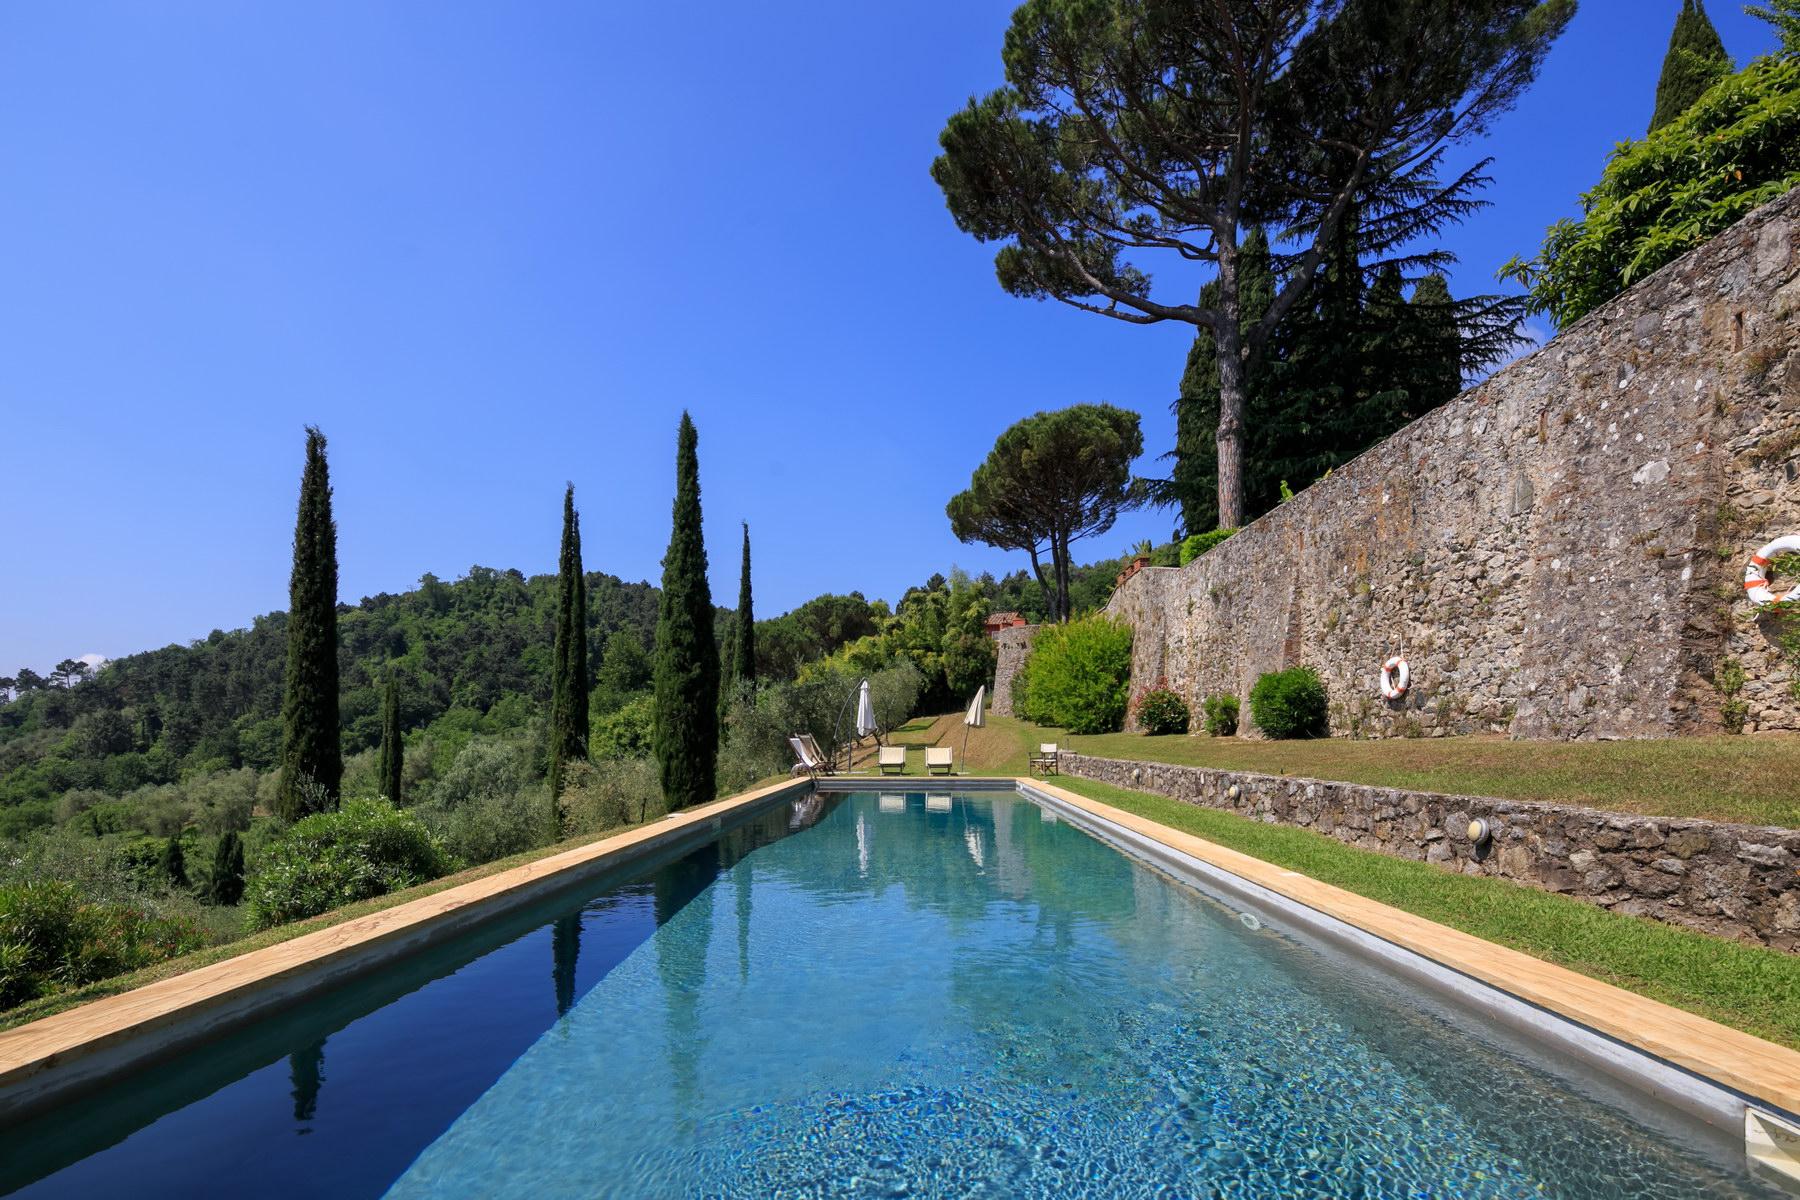 Villa in Vendita a Lucca: 5 locali, 1500 mq - Foto 5